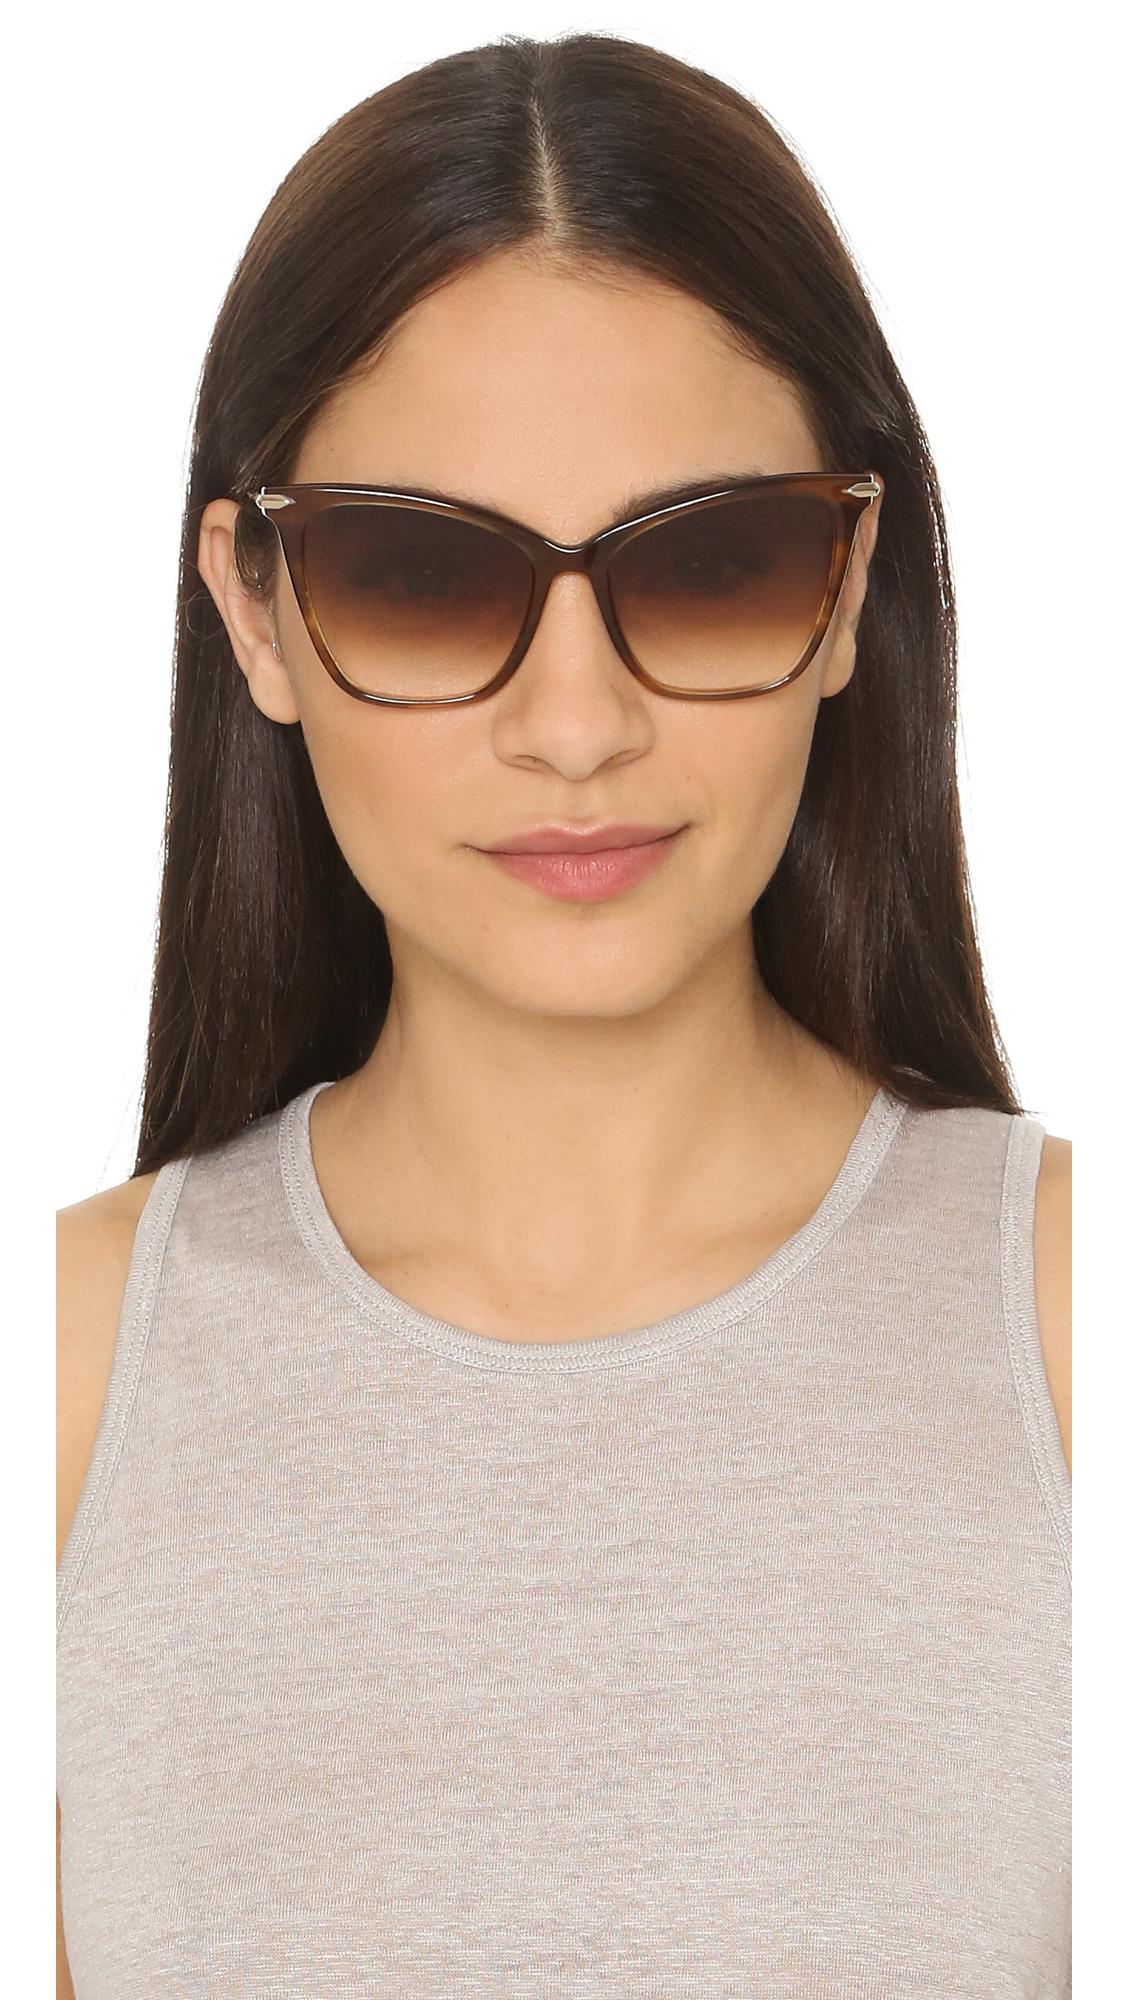 5e411362d77f Lyst - DITA Fearless Sunglasses in Brown